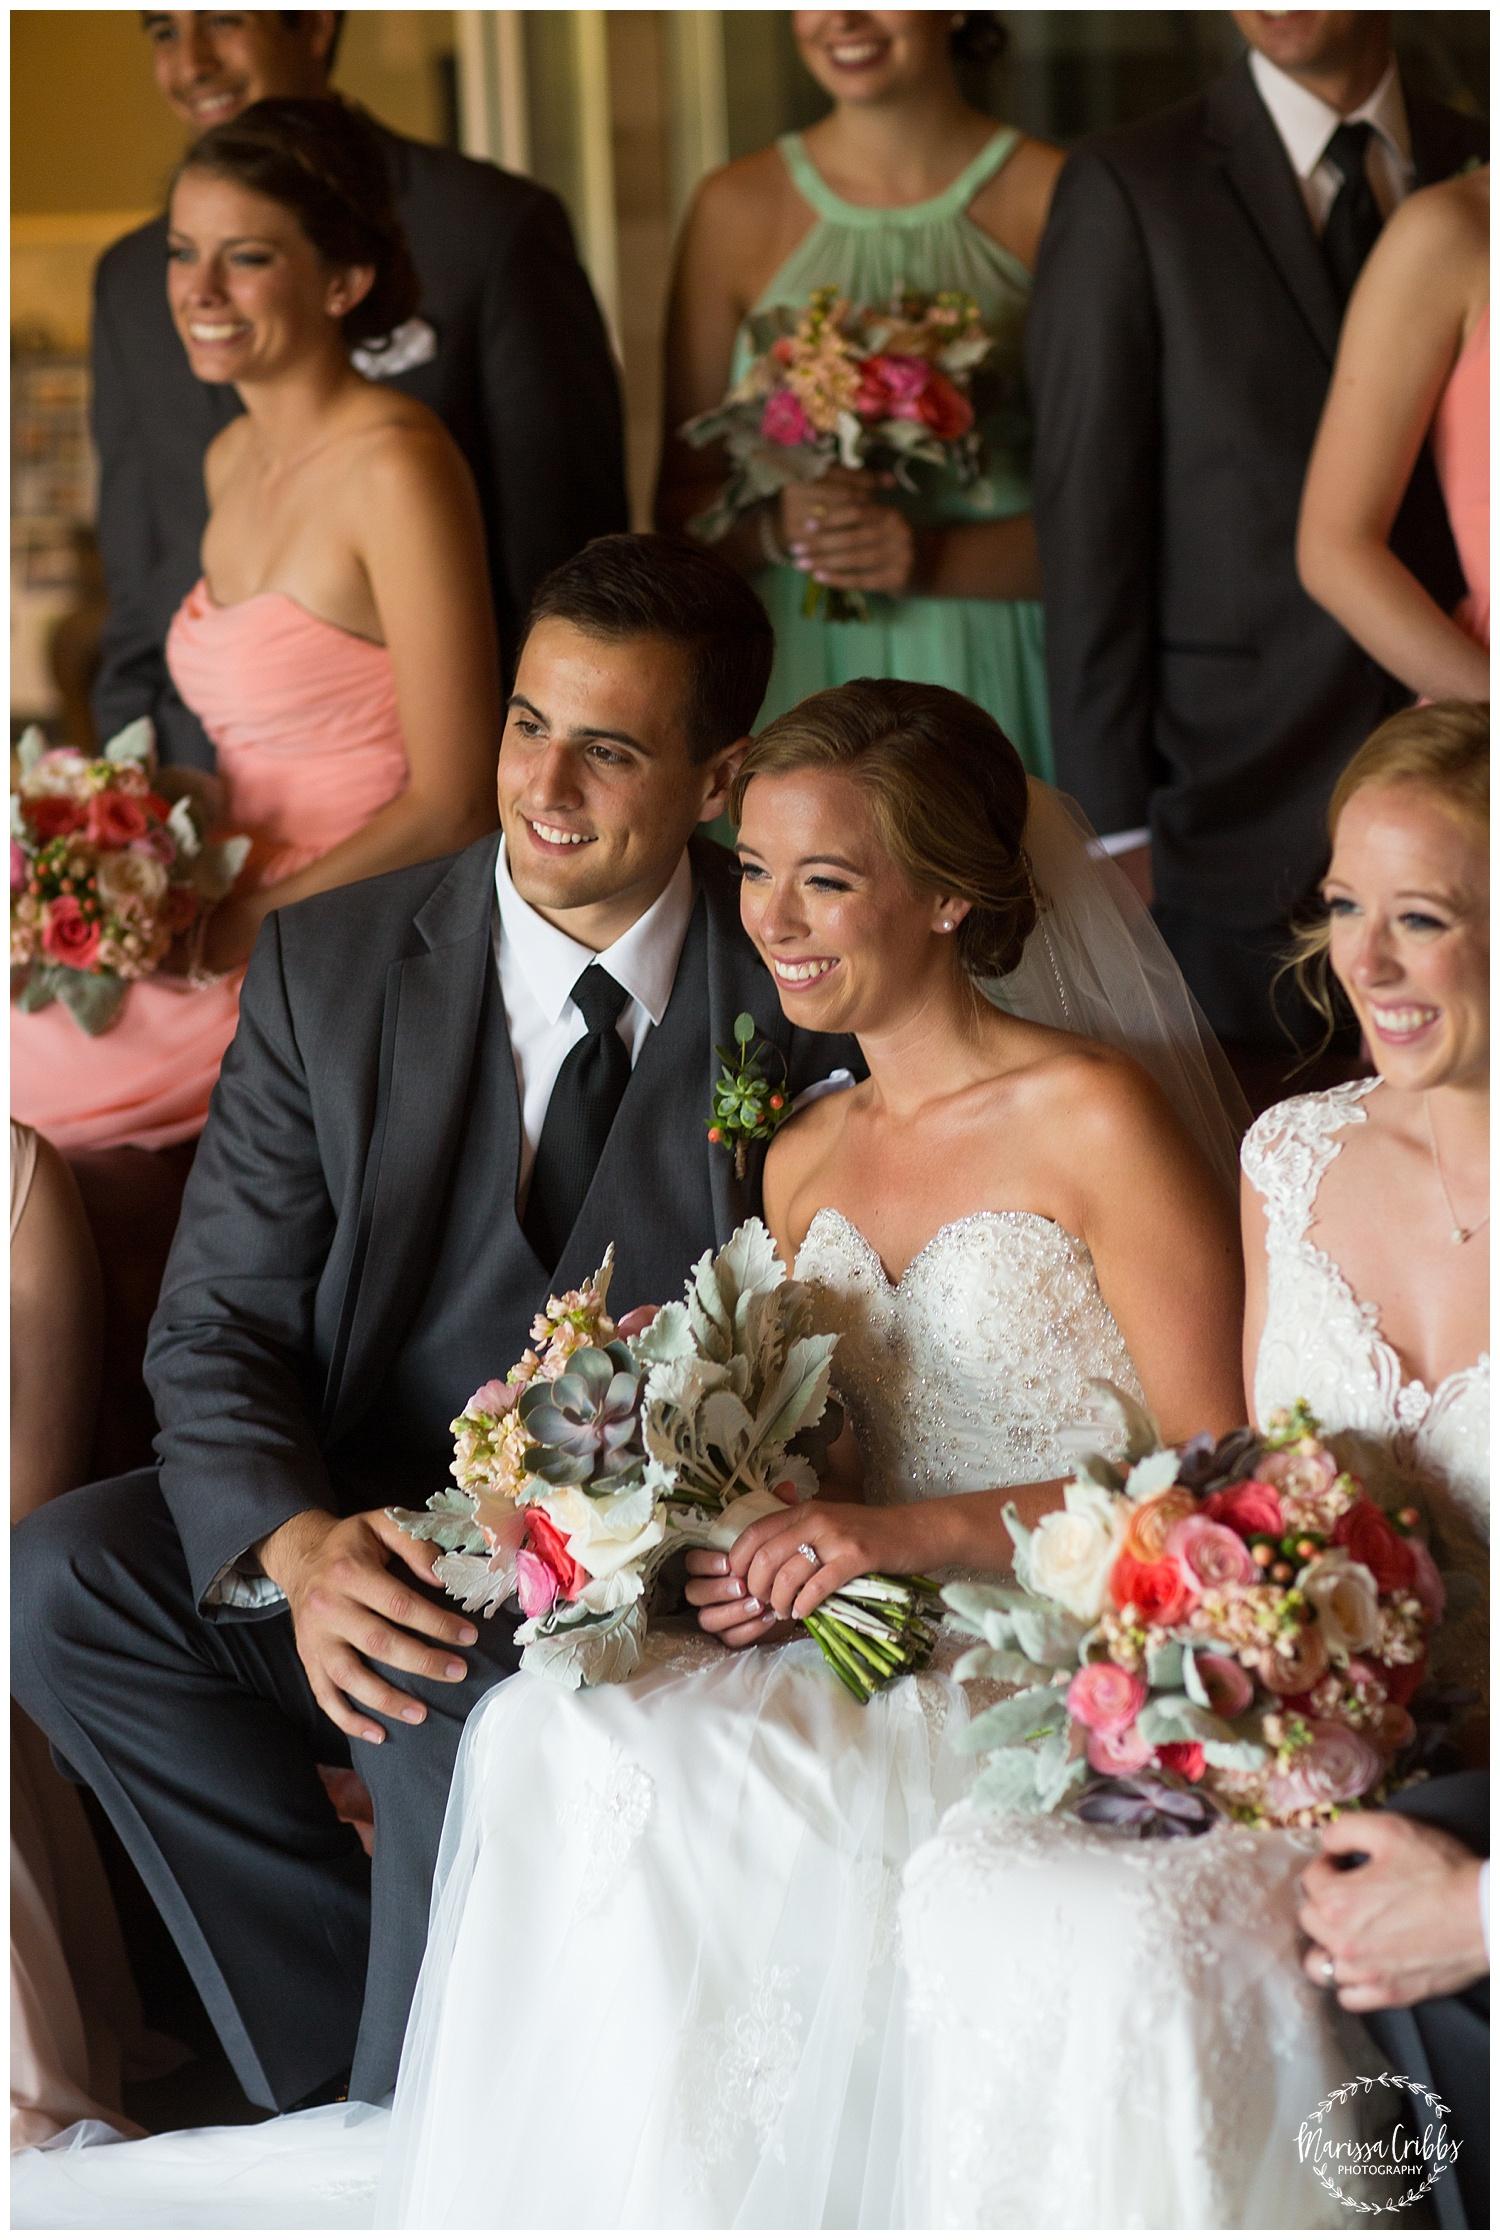 Twin Double Wedding | Union Horse Distilling Co. | Marissa Cribbs Photography | KC Weddings_0078.jpg